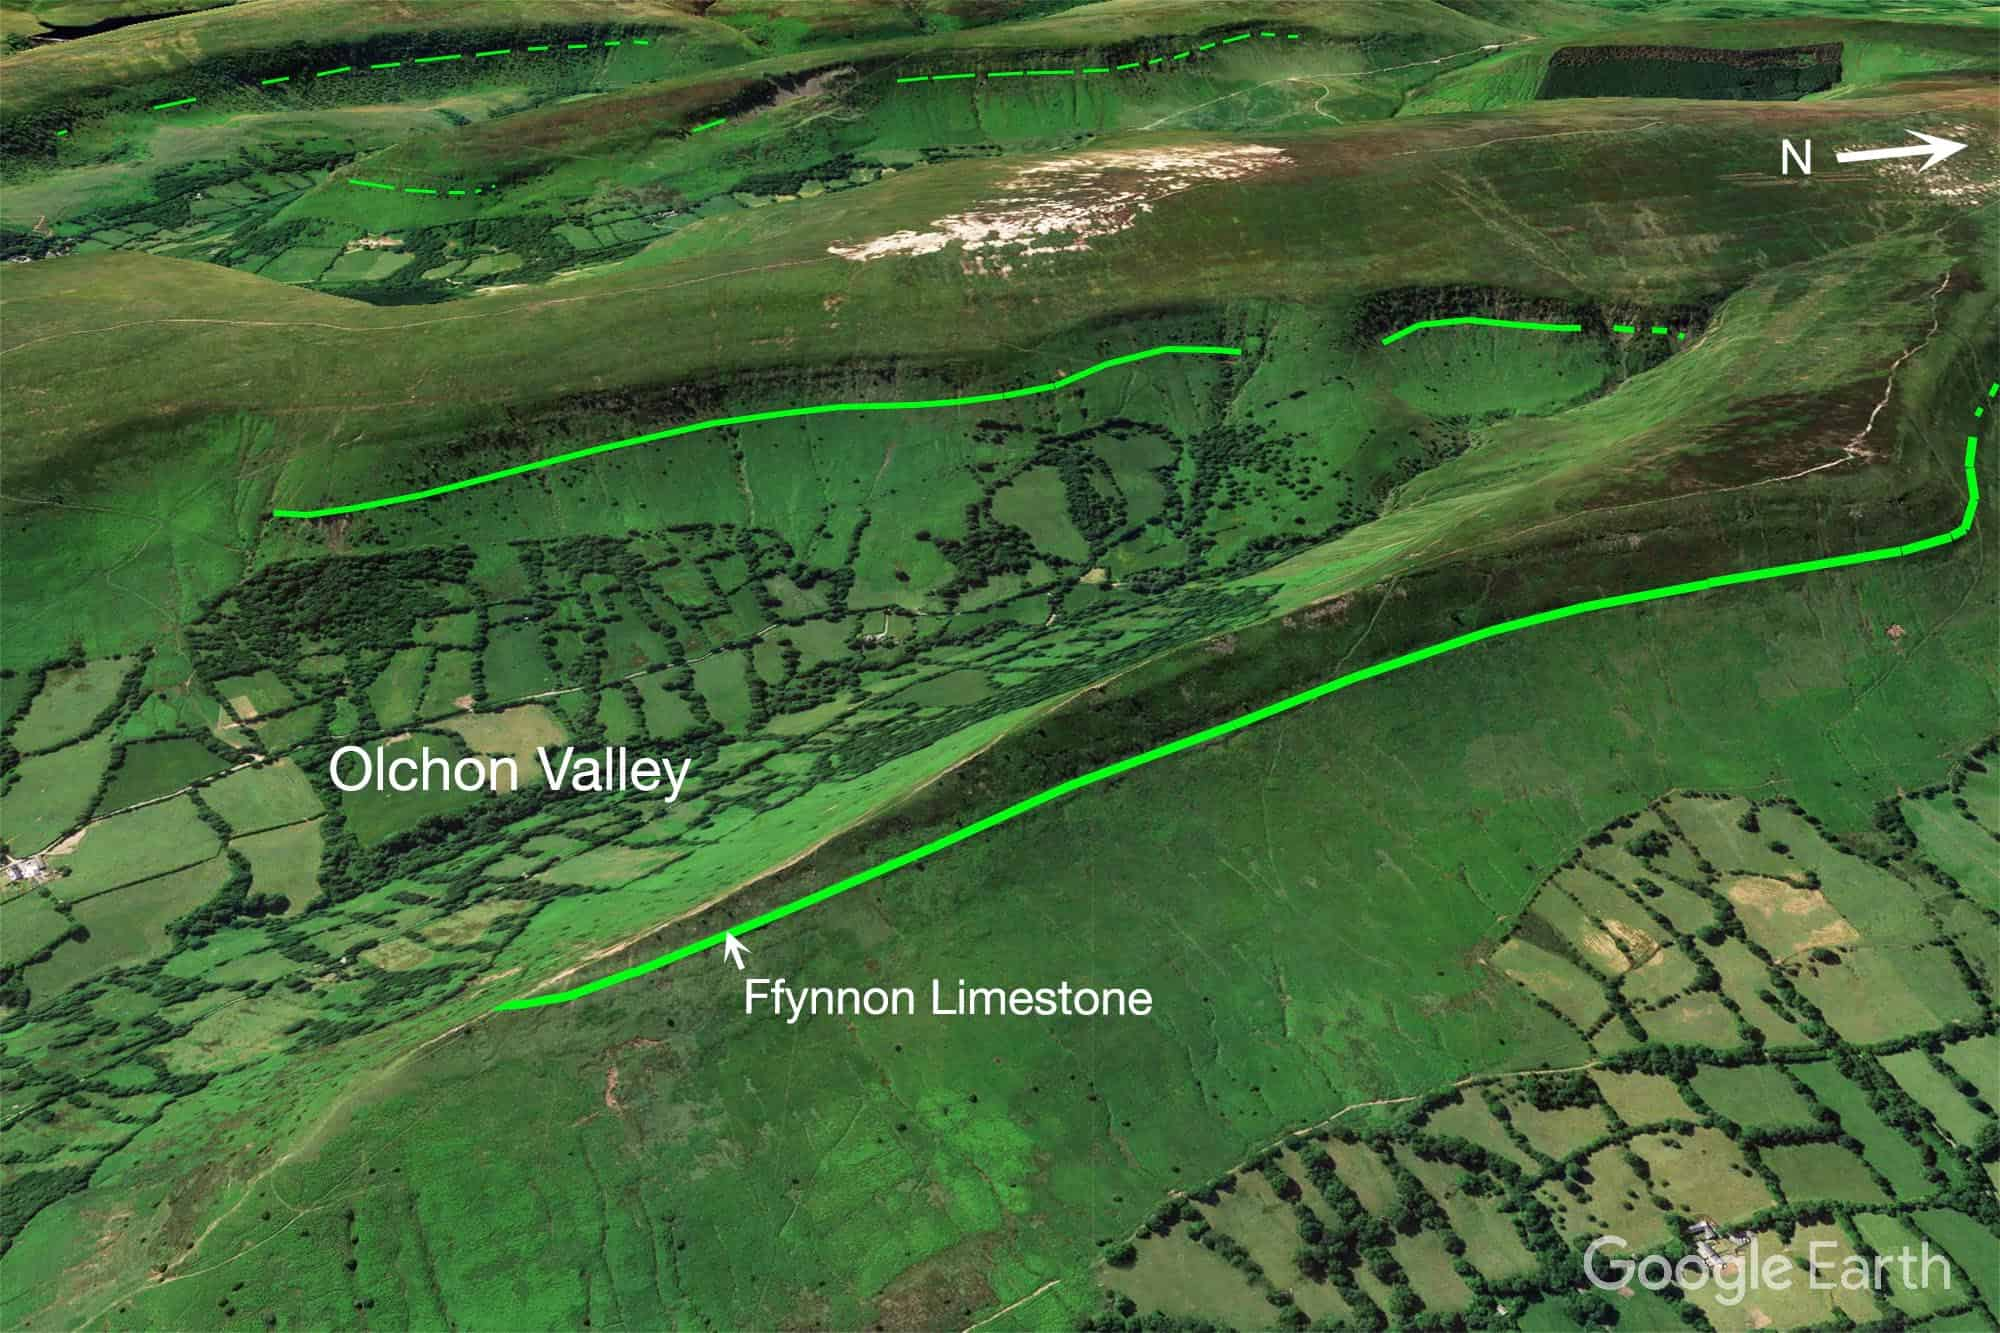 Outcrop of Ffynnon Limestone Black Mountains